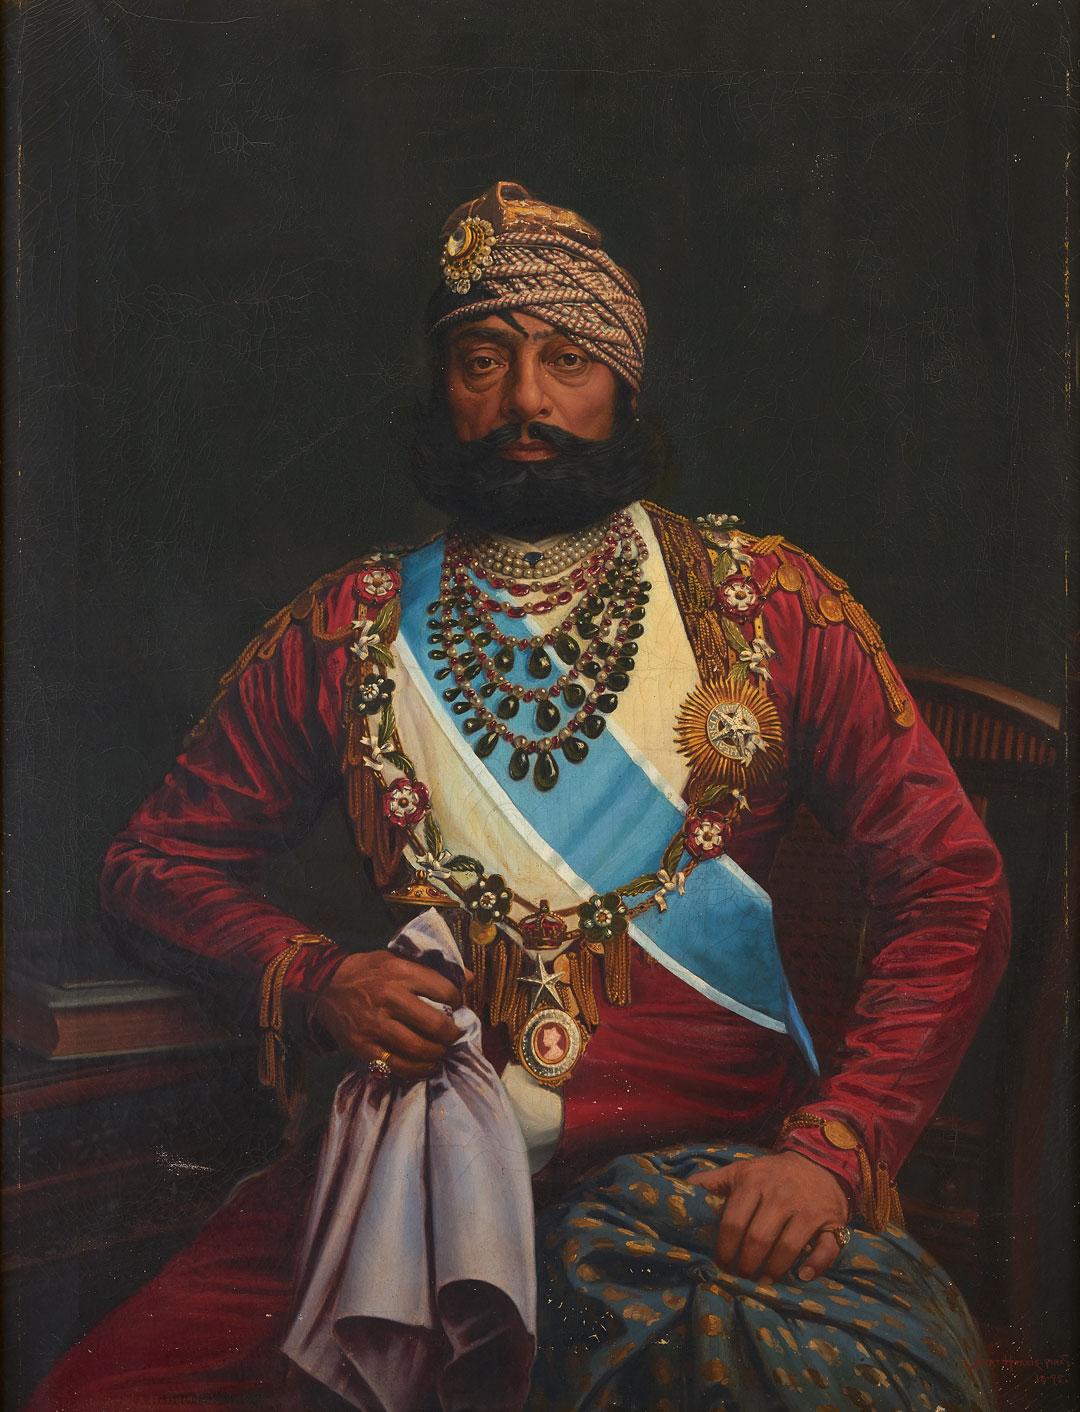 Portrait of Maharaja Jaswant Singh II, 1895